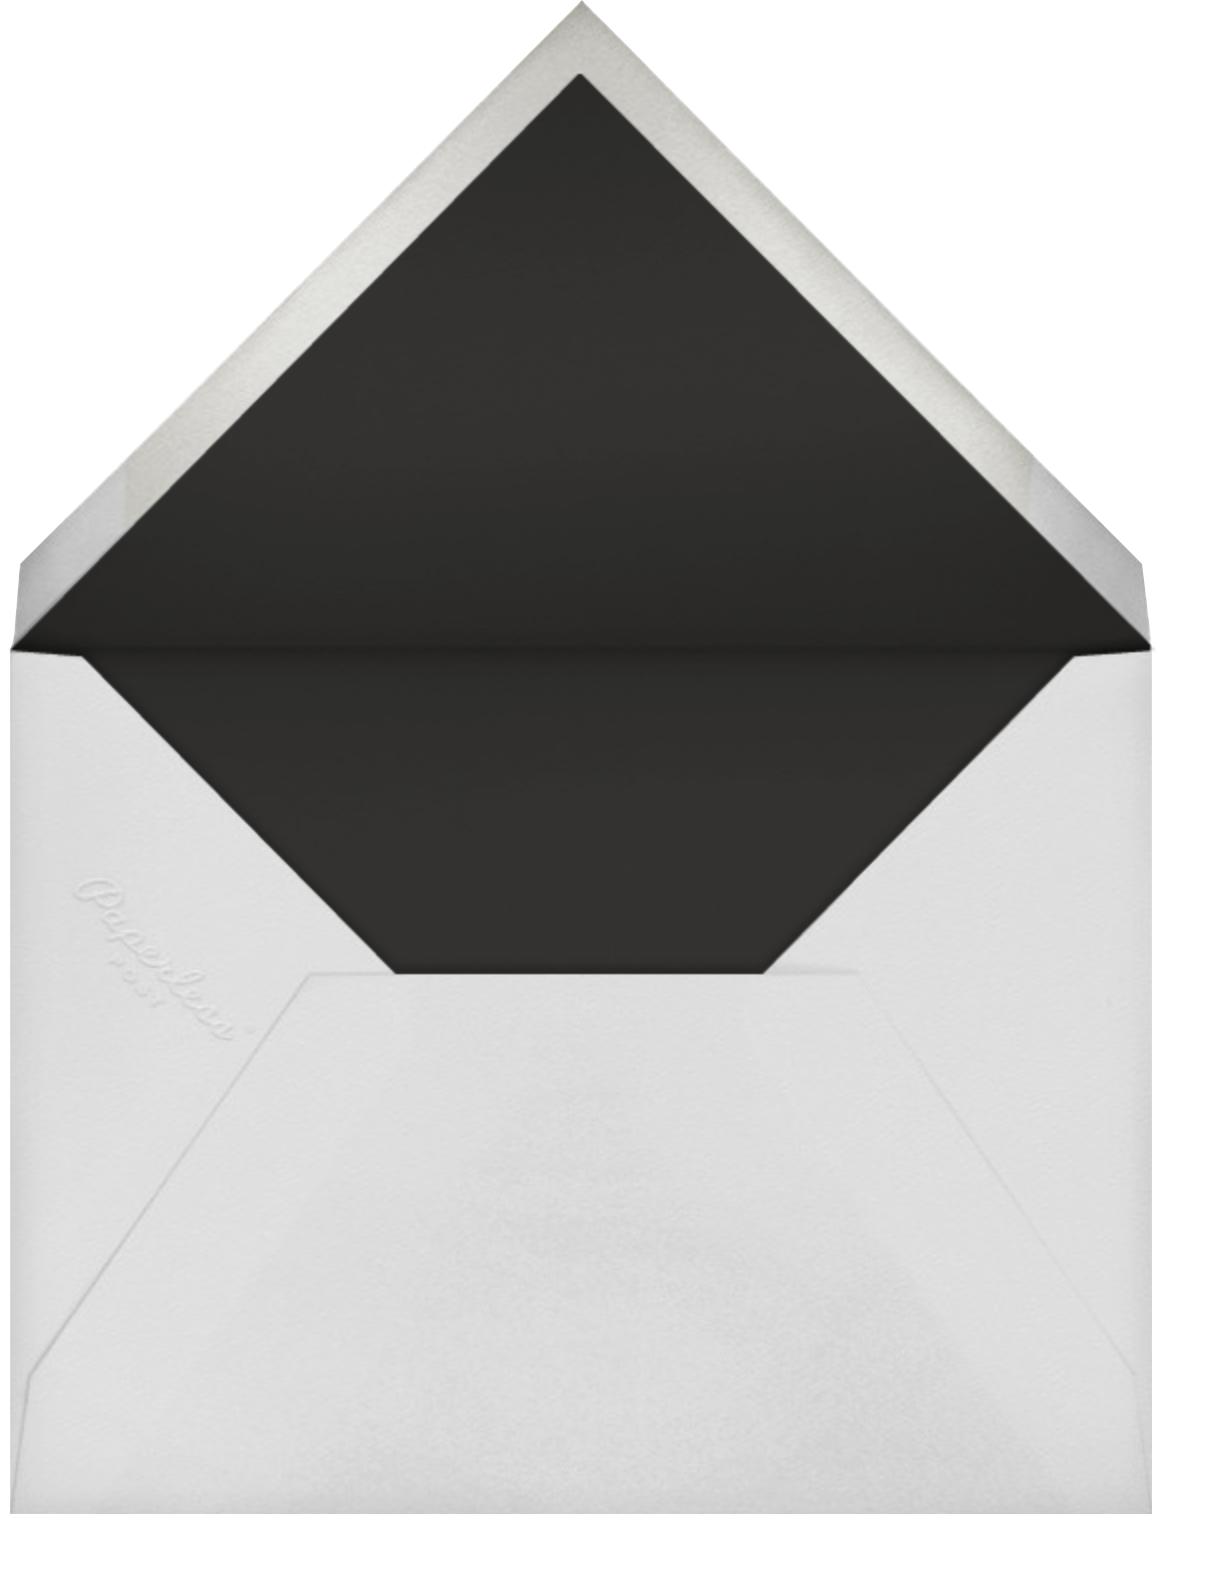 Singer (Stationery) - Pewter Gray - Vera Wang - Personalized stationery - envelope back